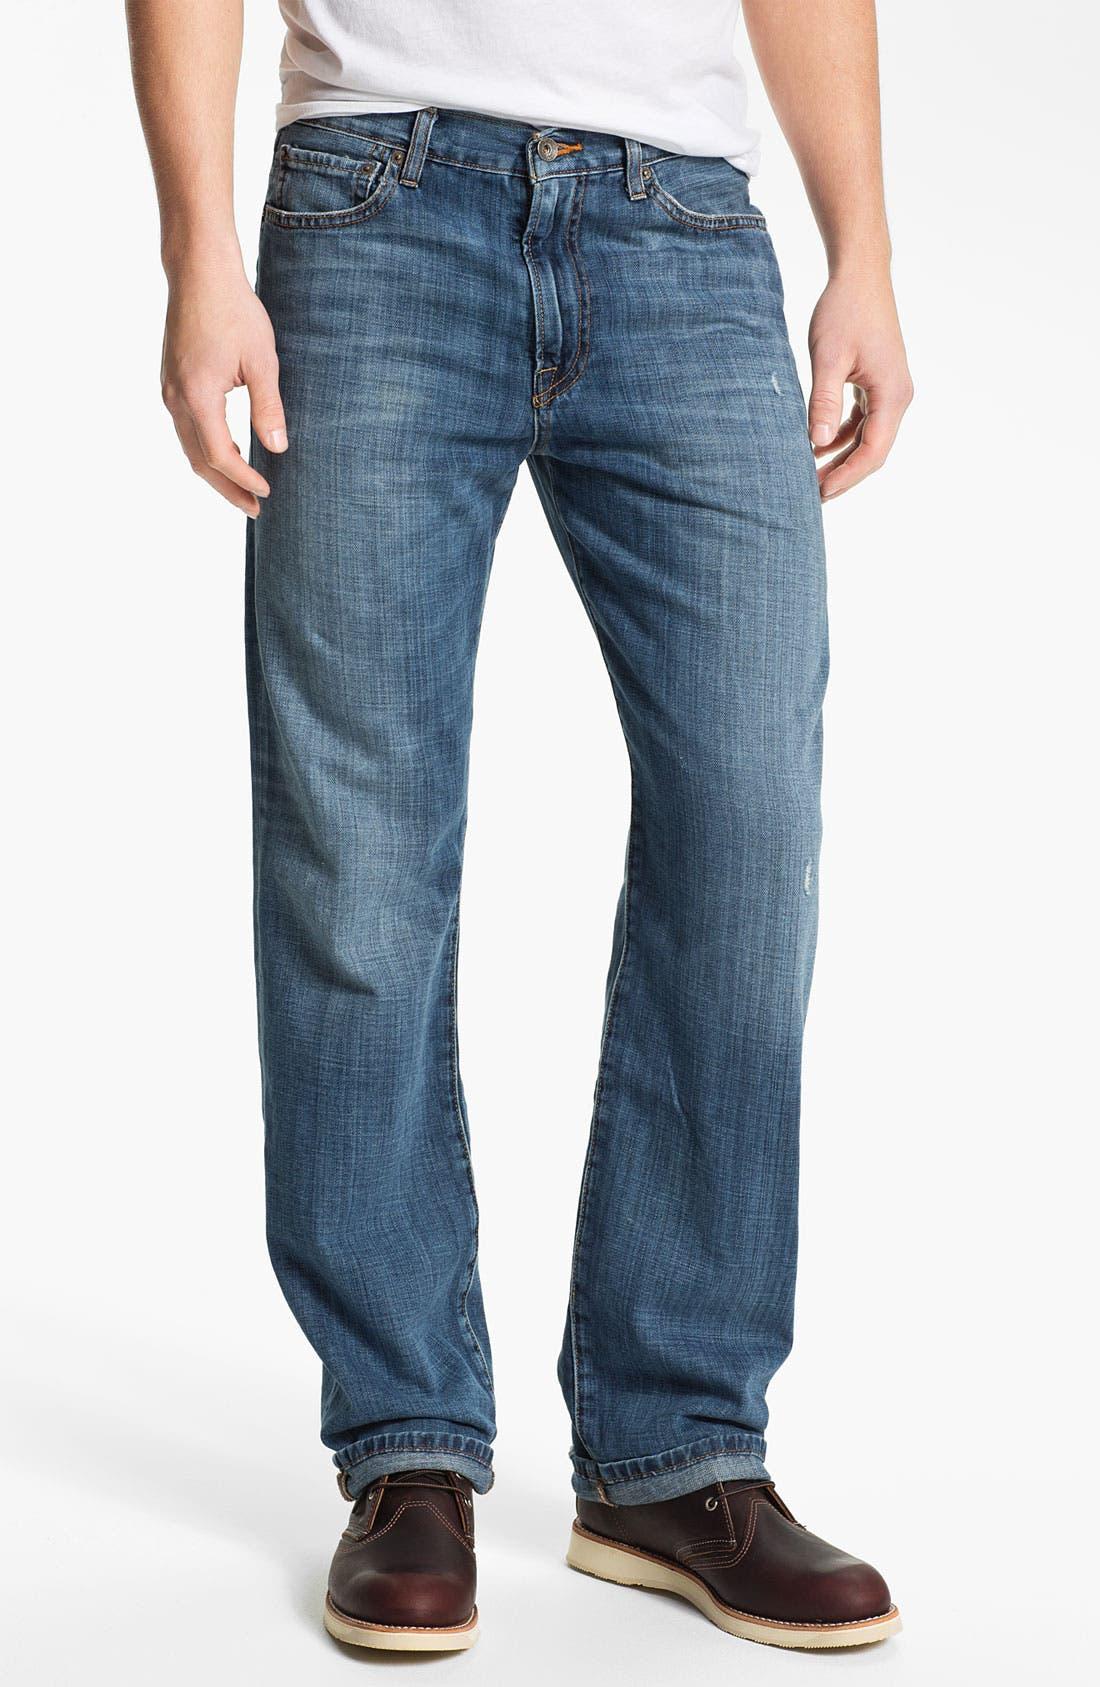 Alternate Image 1 Selected - Lucky Brand '329 Classic' Straight Leg Jeans (Light Gessner)